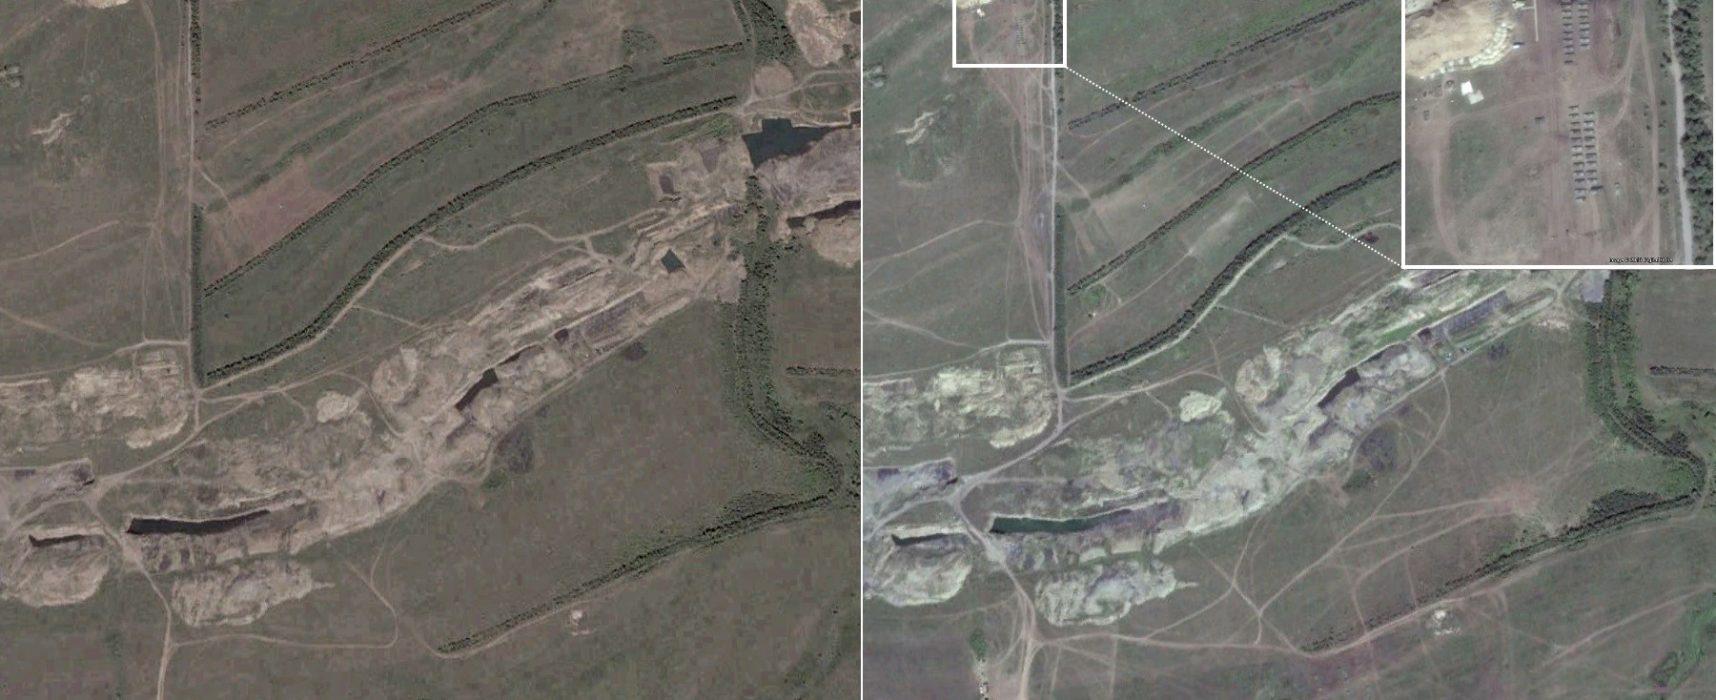 Tanks of Buhaivka: A training facility in Eastern Ukraine